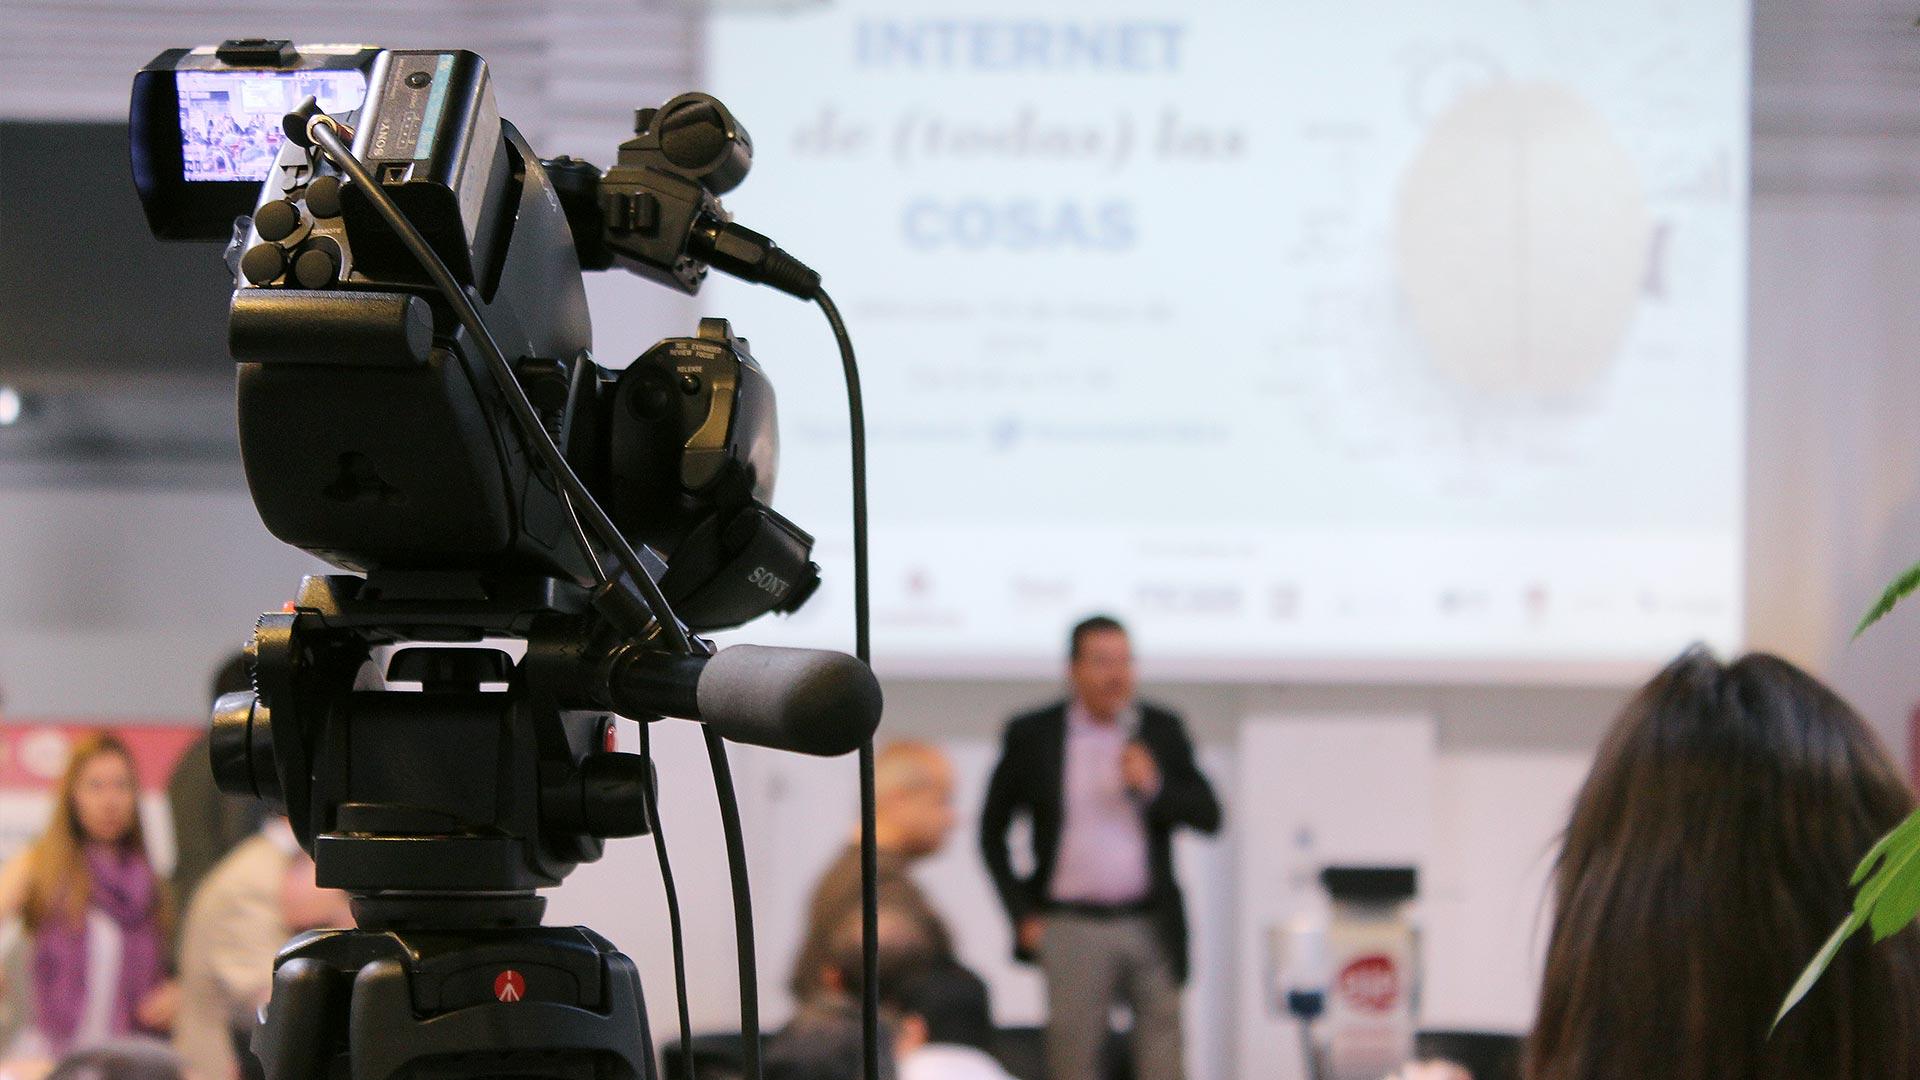 tpnet-eventos-encuentros-profesionales-iot-camara-streaming